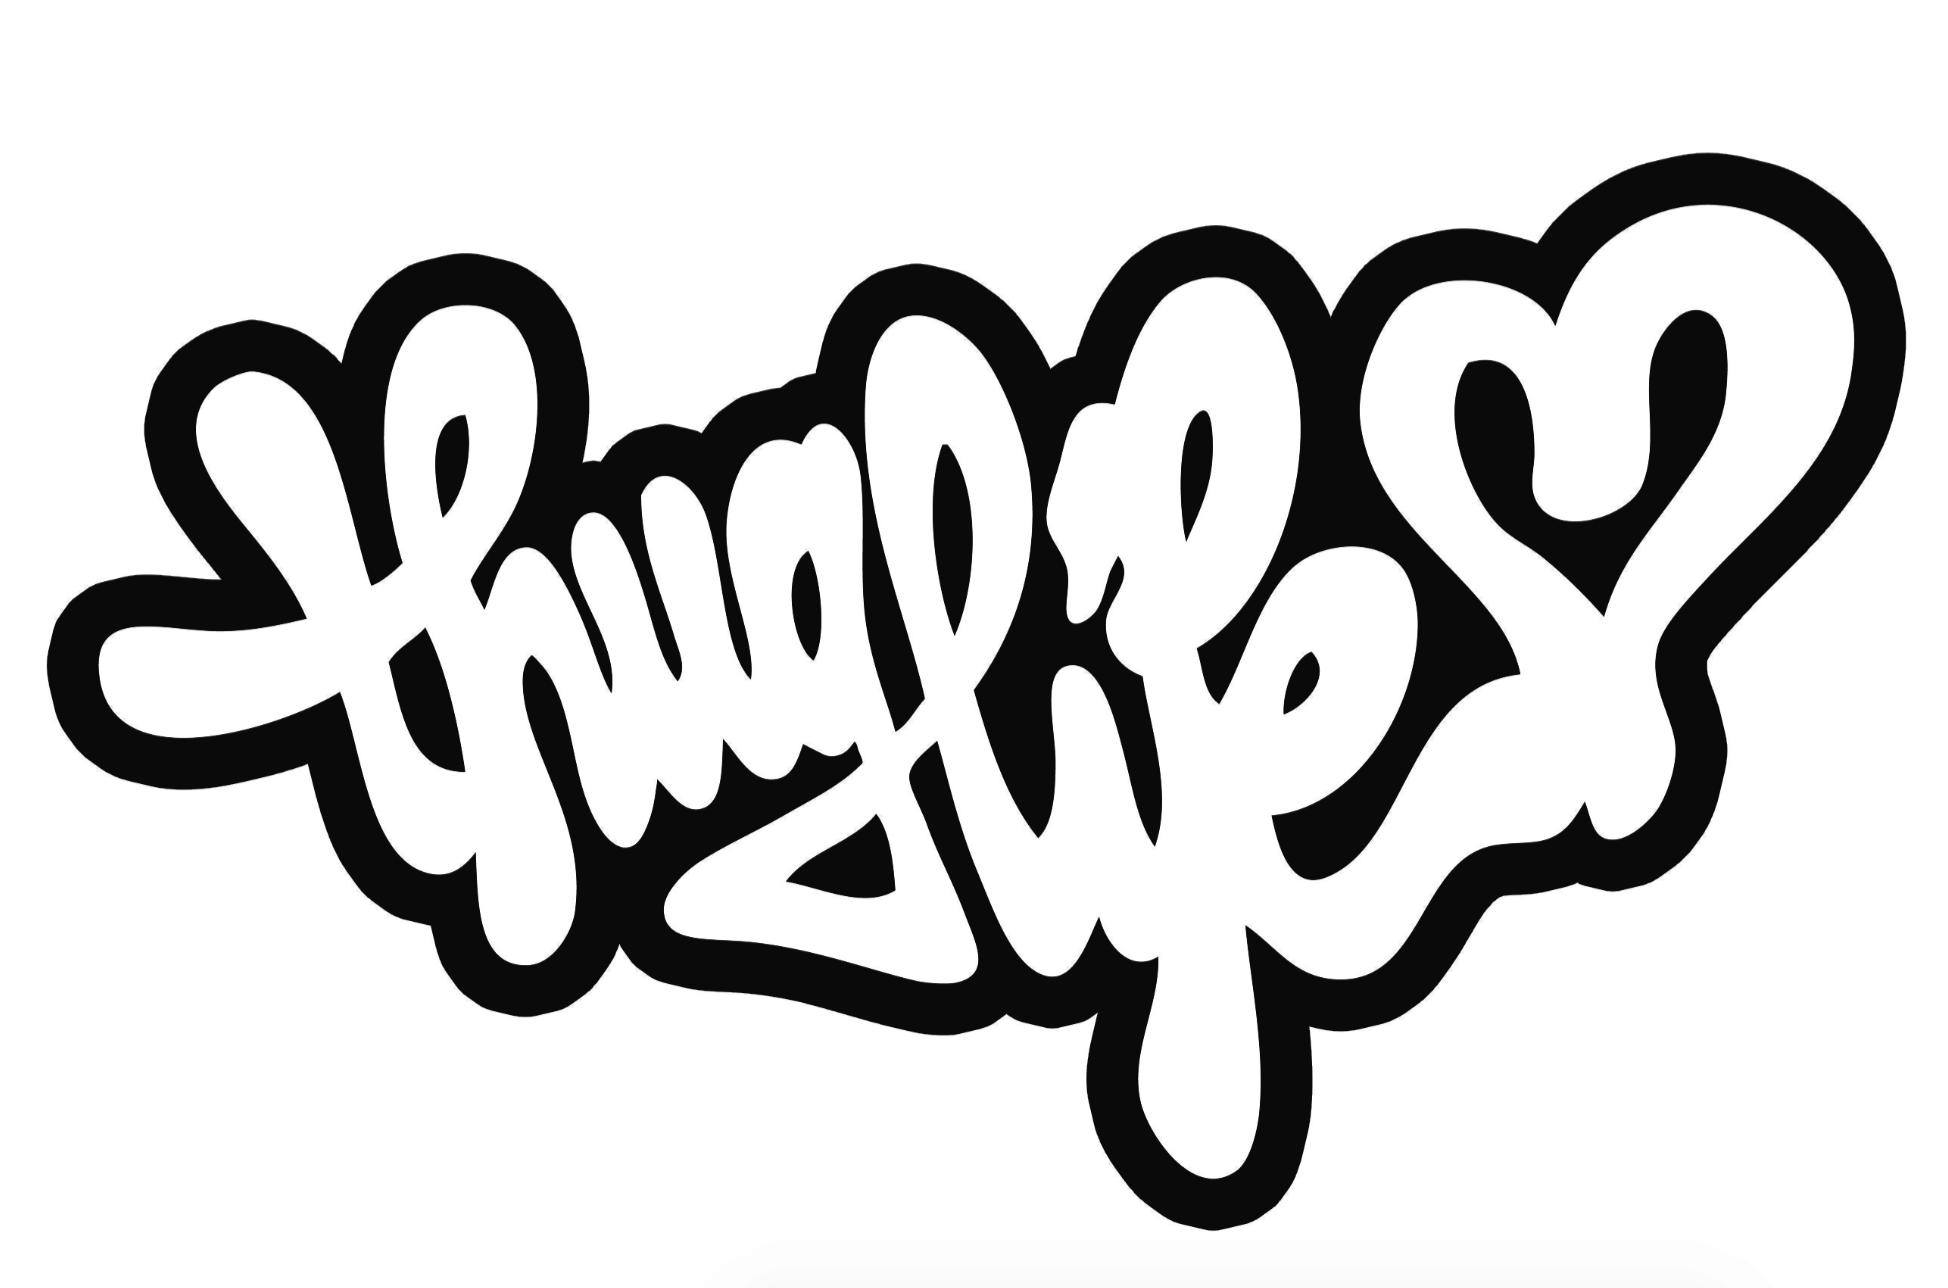 bebar thuglife magazine logo